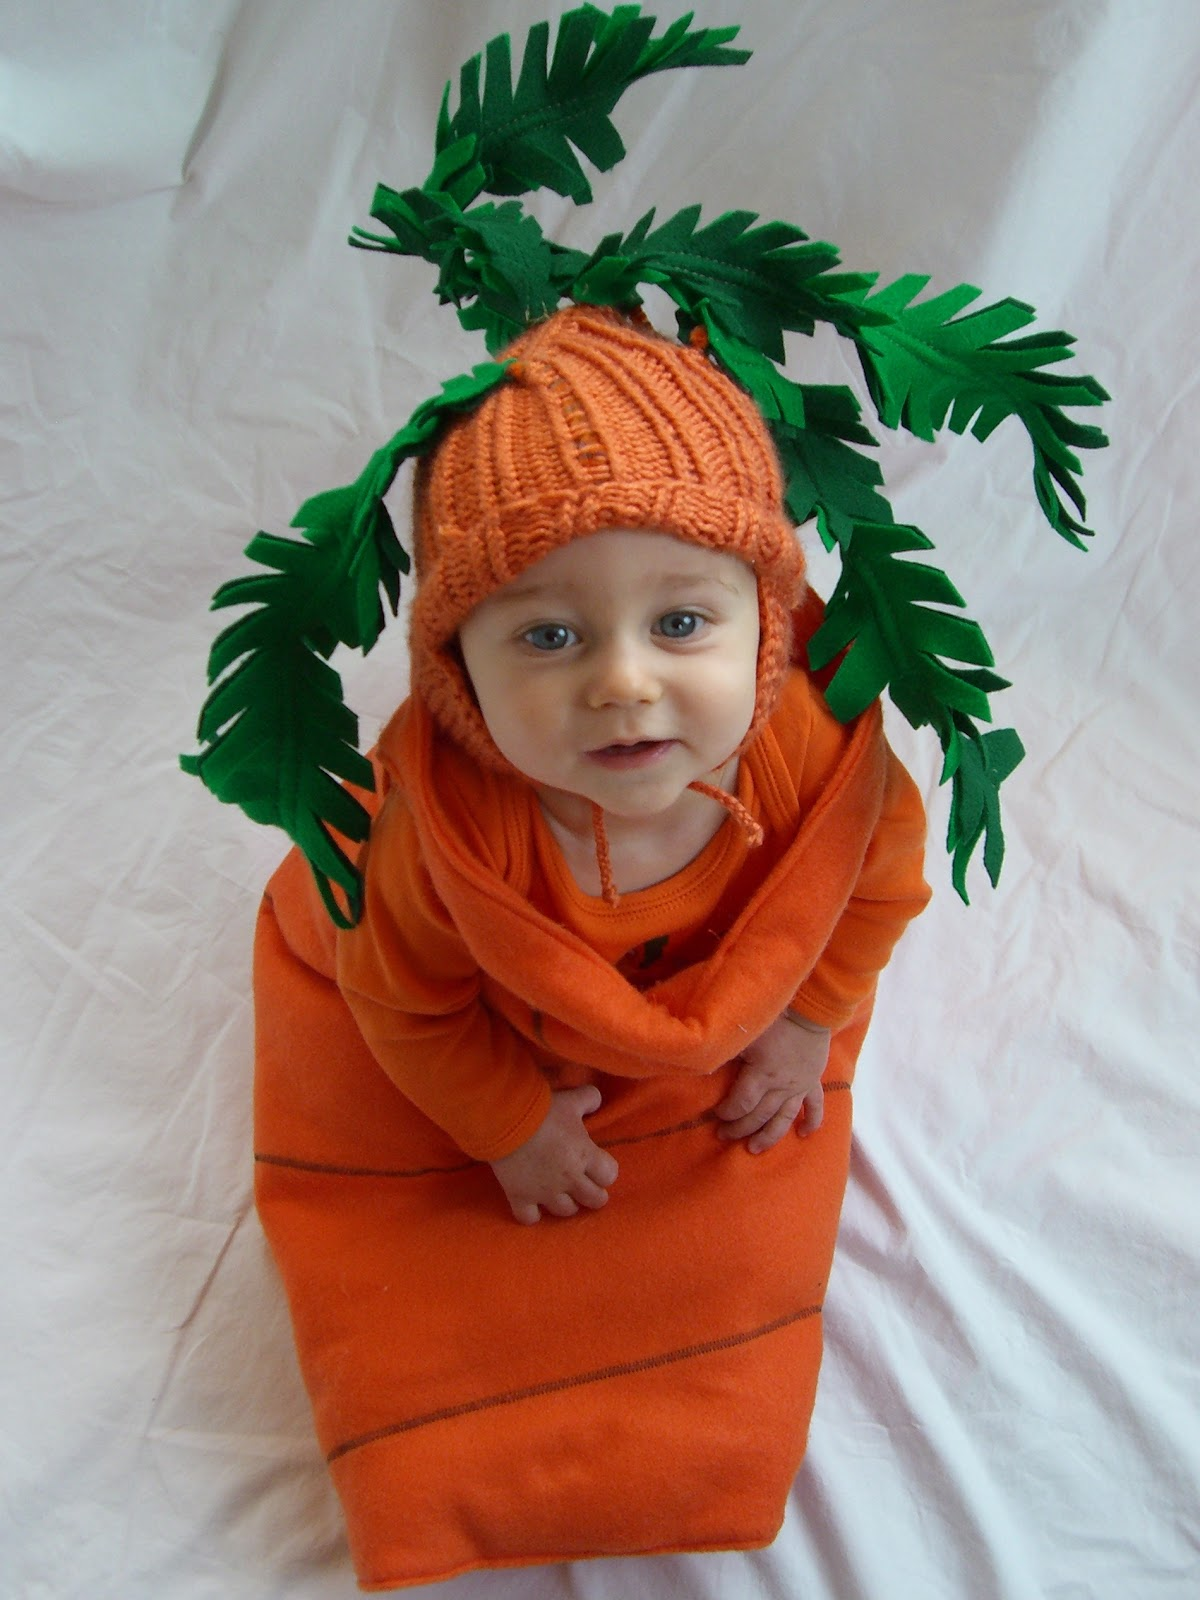 Thursday October 28 2010  sc 1 st  everywhere orange & everywhere orange: Carrot Costume